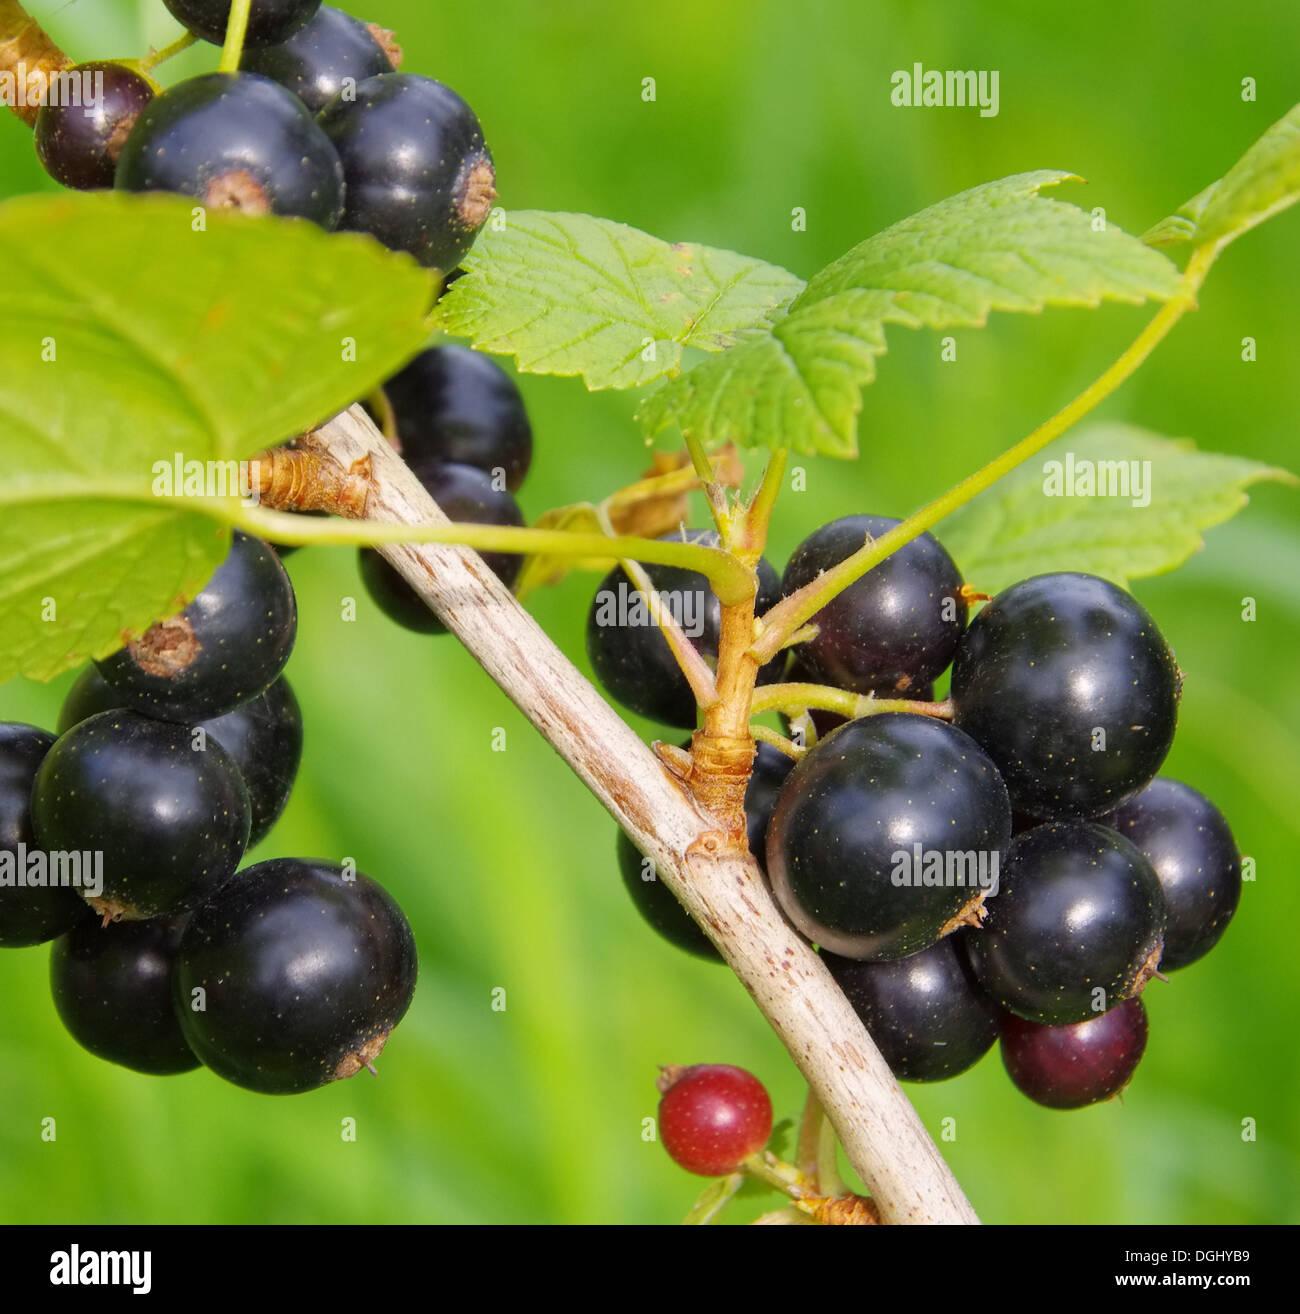 Johannisbeere schwarz - black currant 02 - Stock Image